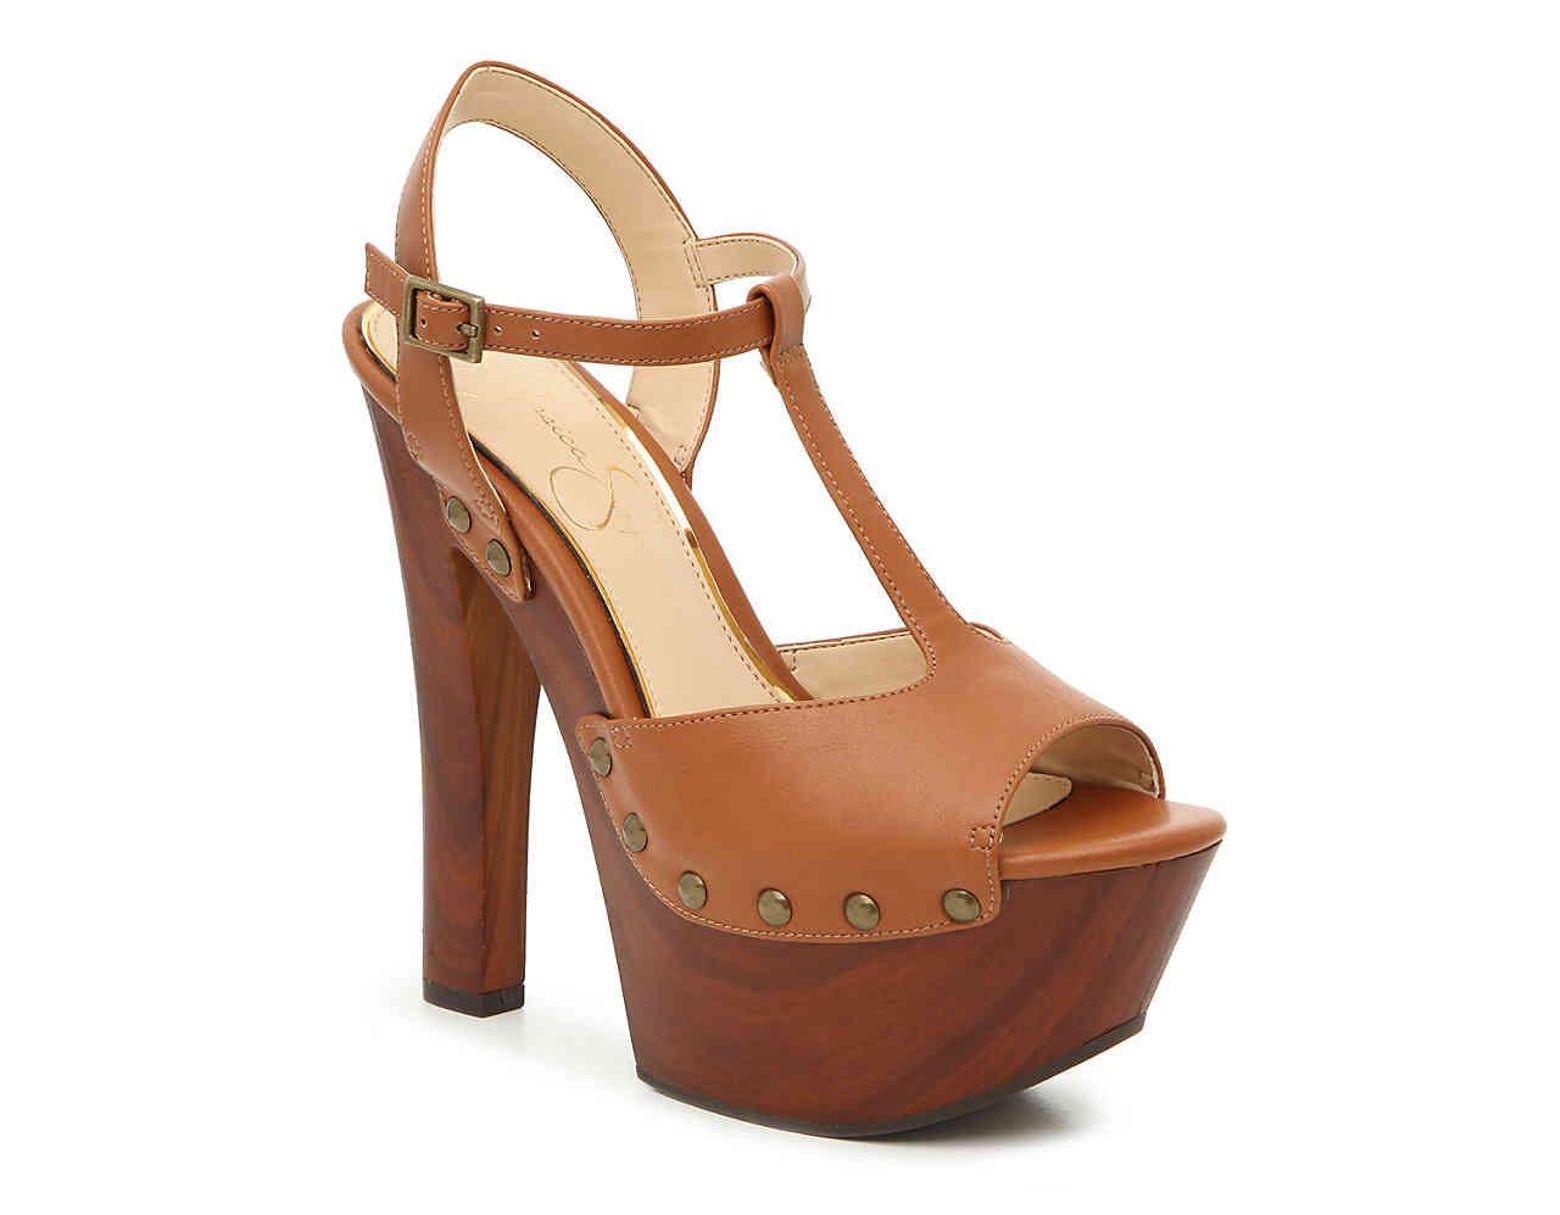 abc94d3911 Jessica Simpson Desila Platform Sandal in Brown - Lyst